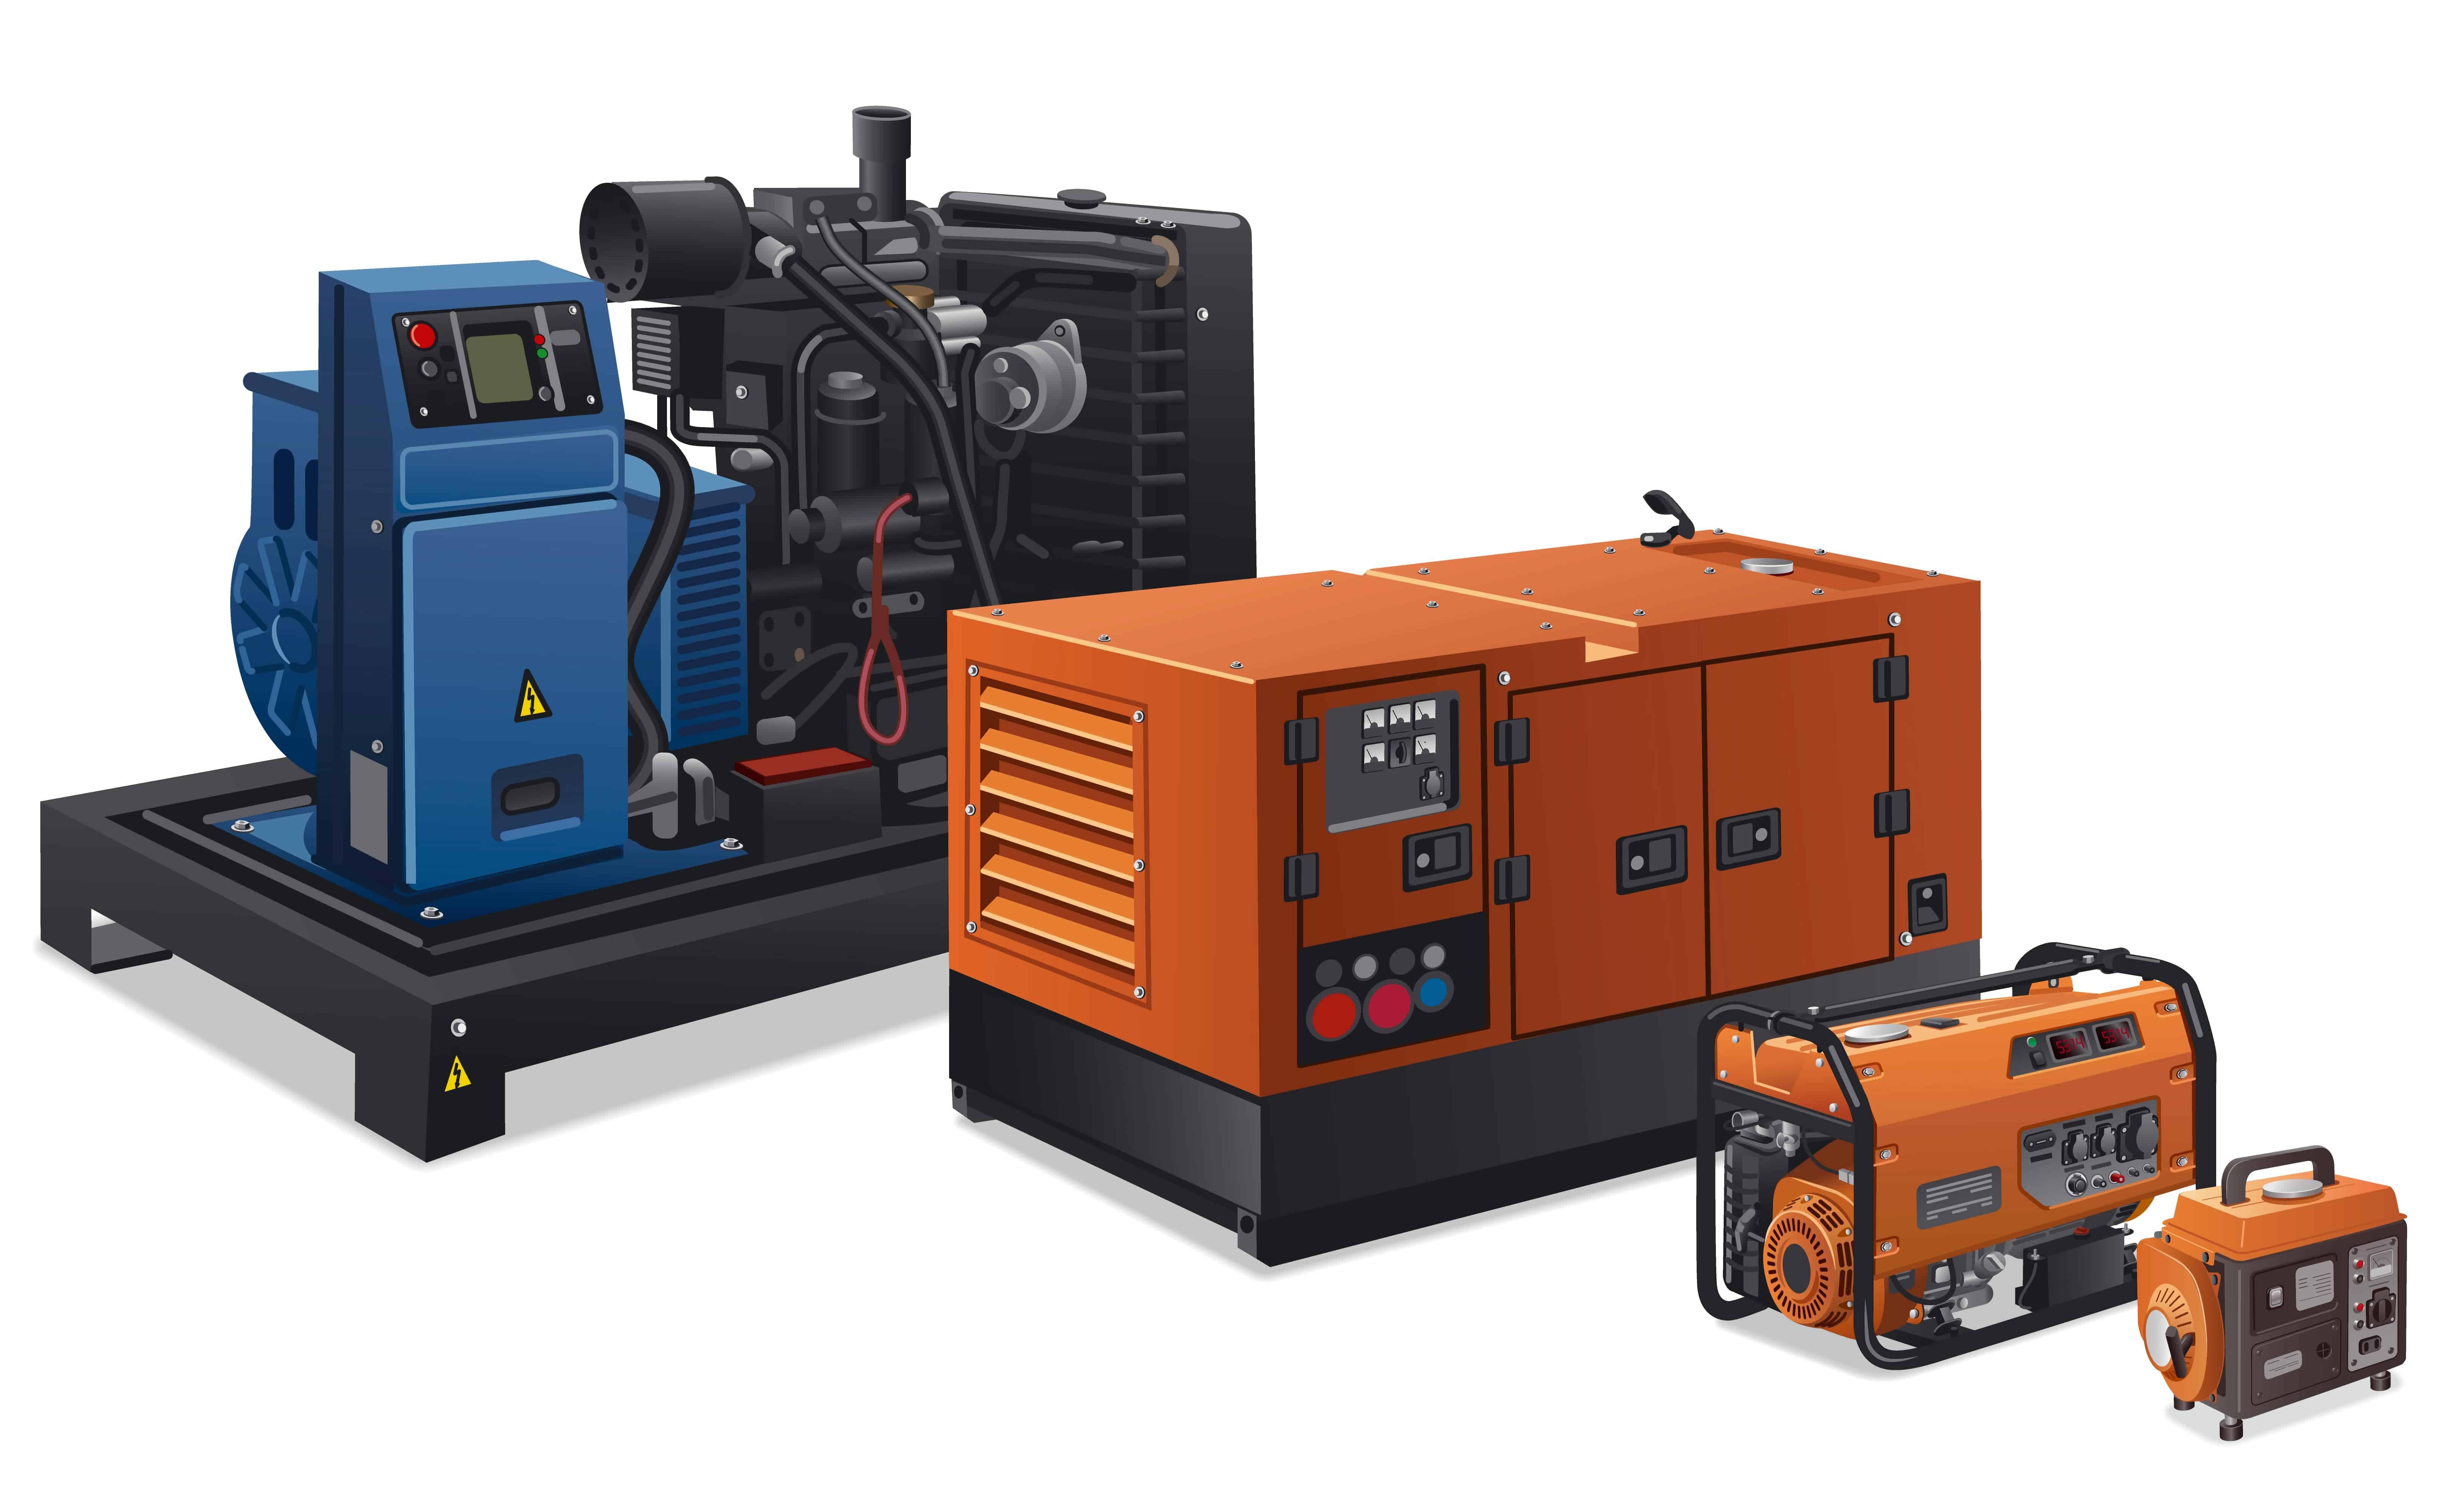 Different types of generators.